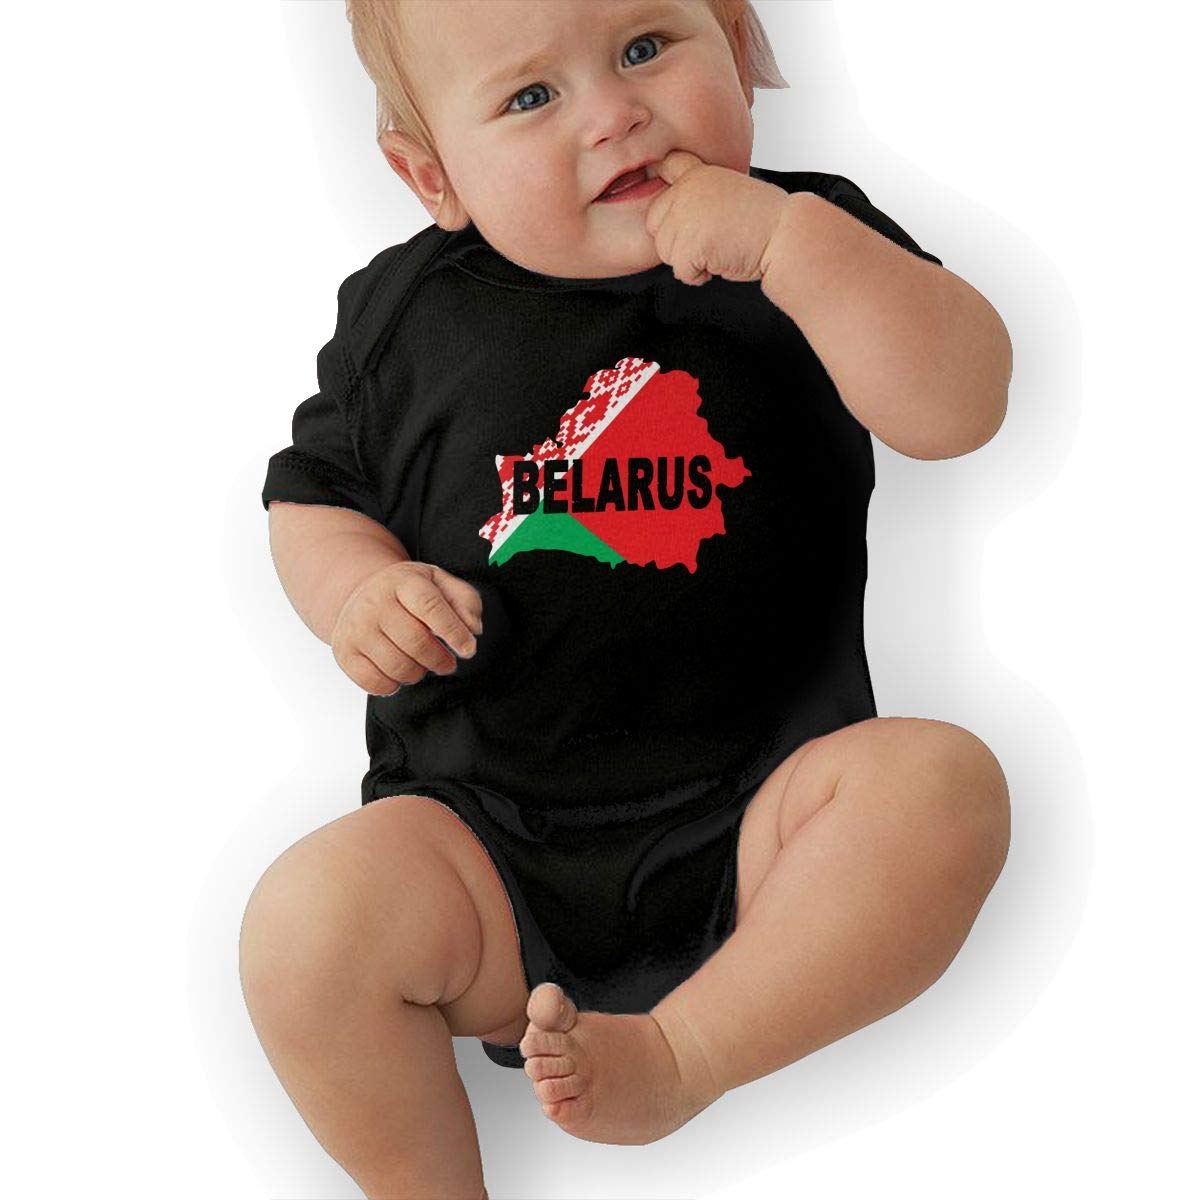 Mri-le2 Newborn Baby Short Sleeve Jersey Bodysuit Belarus Flag Map Infant Romper Jumpsuit